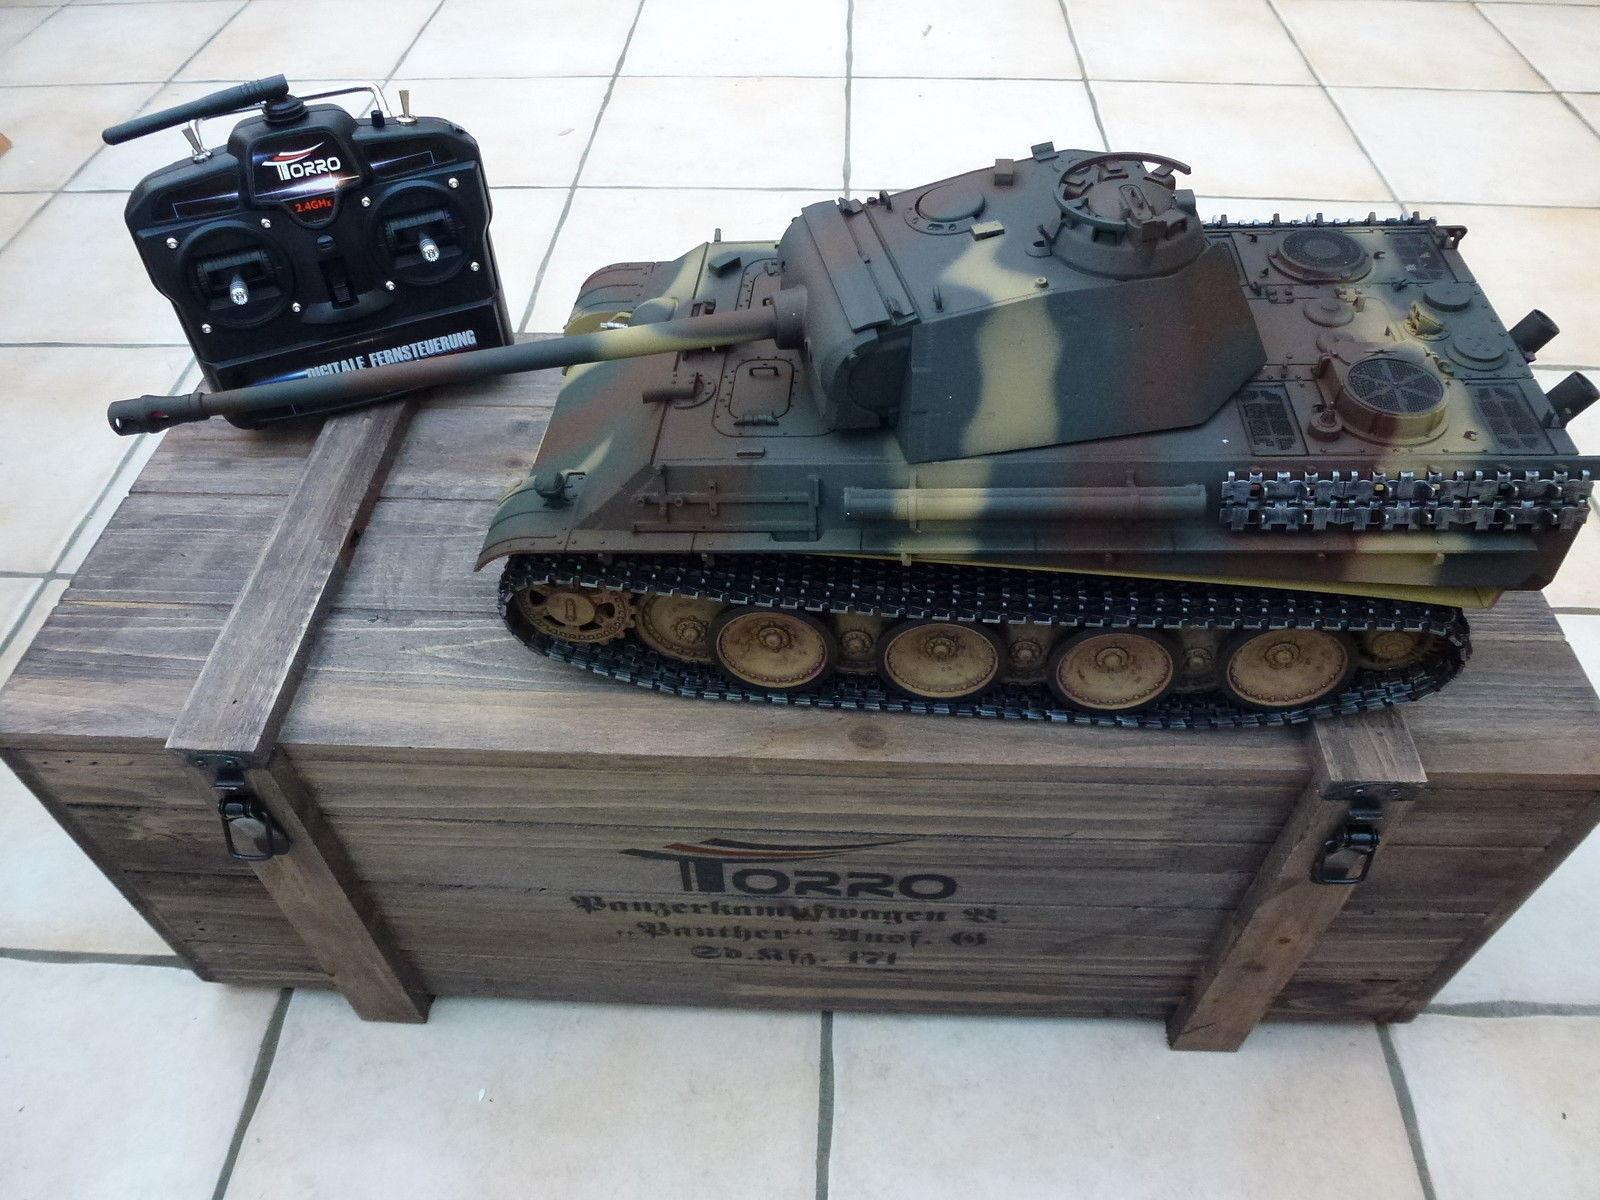 Torro 1/16 RC Panther Ausf G German-IR Tank Camo 2.4GHz metallo 360 scatola in legno